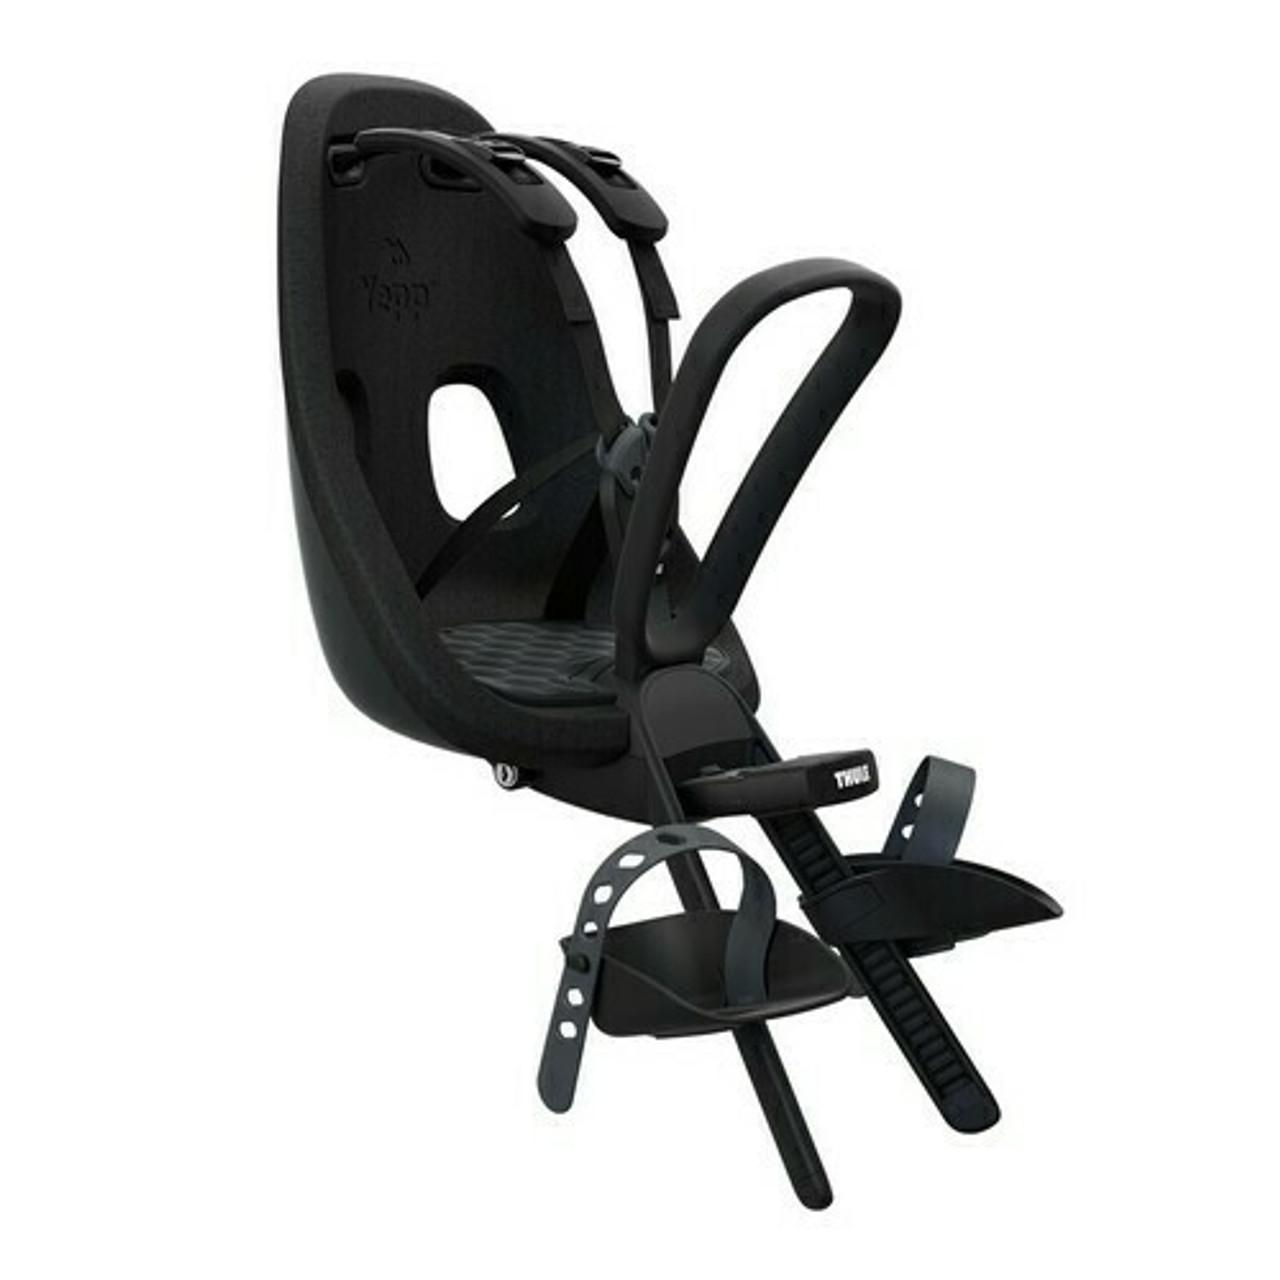 Thule Yepp - Front Bike Seat For Child - Obsidian (Black) Nexxt Mini